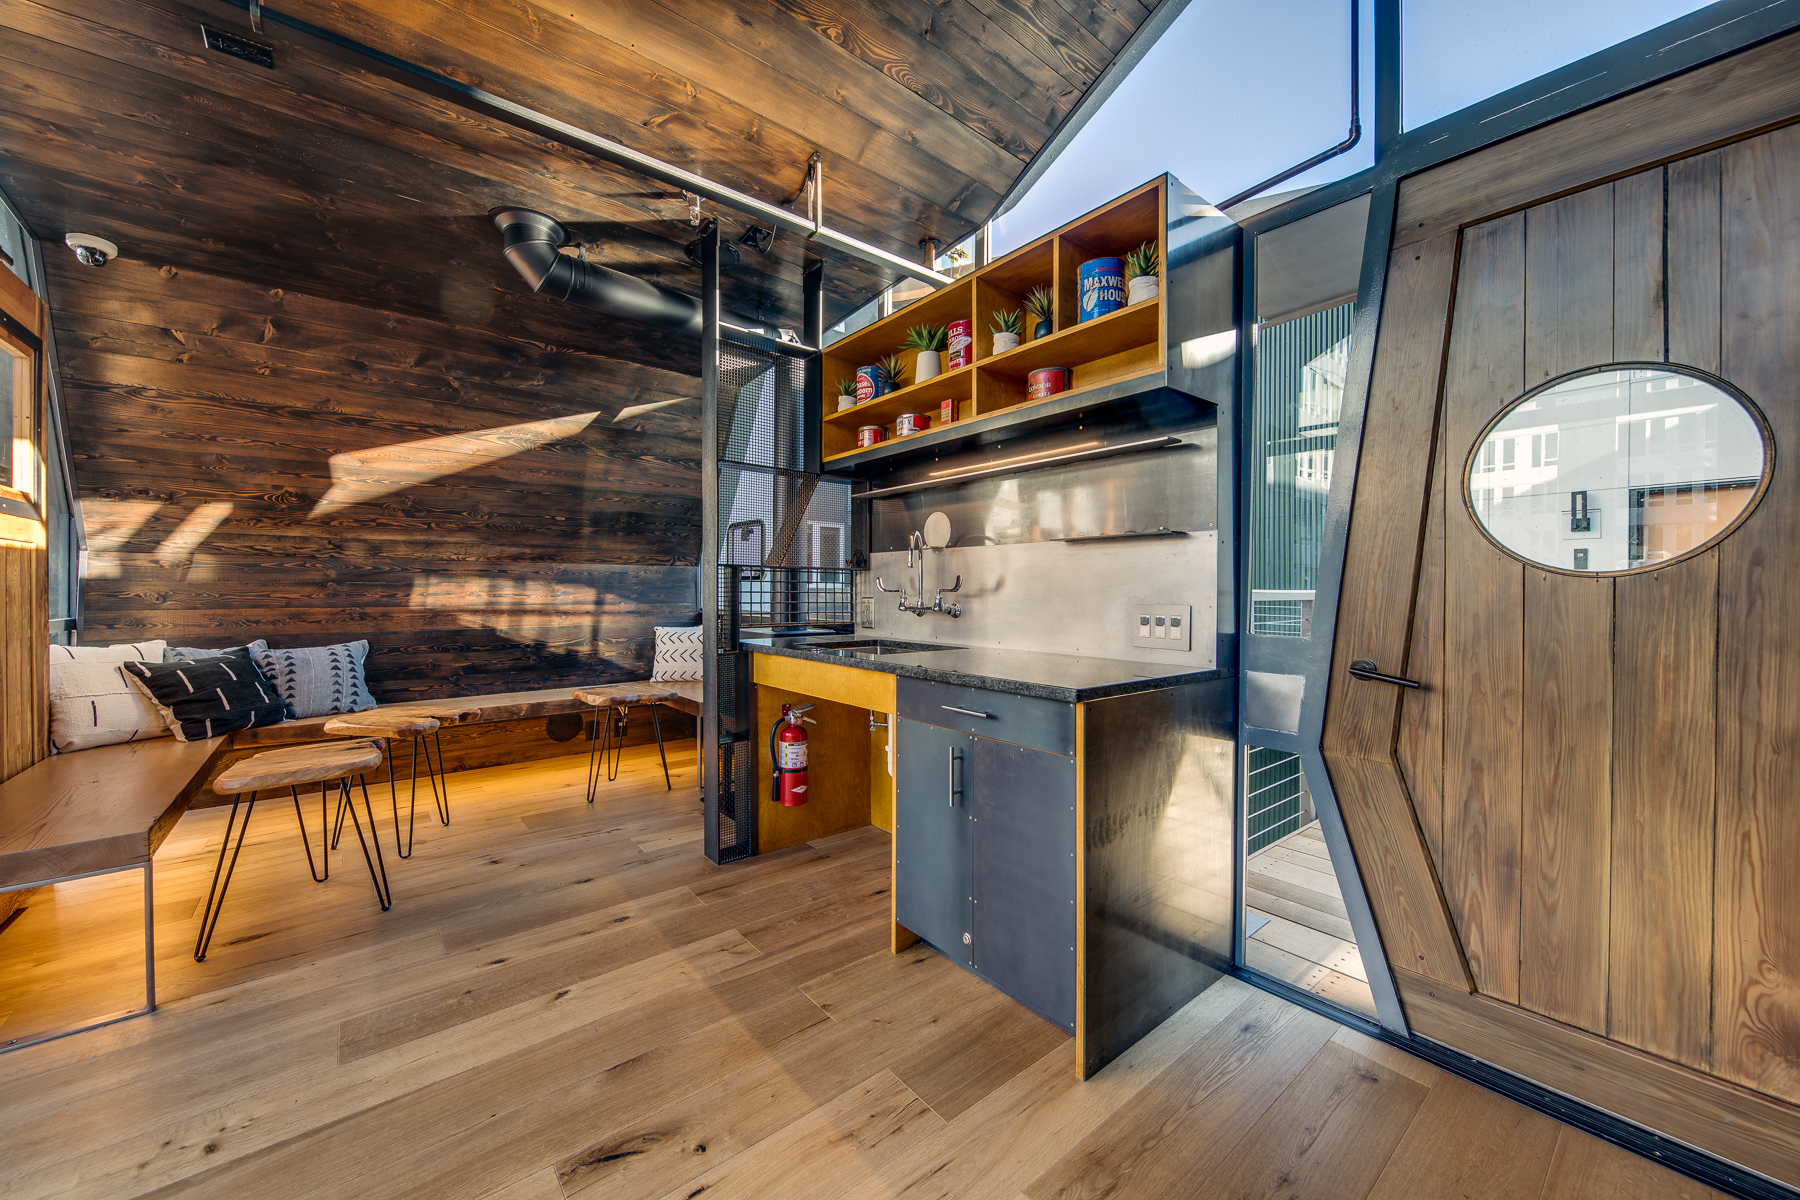 The latest SLU apartment amenity is a communal treehouse